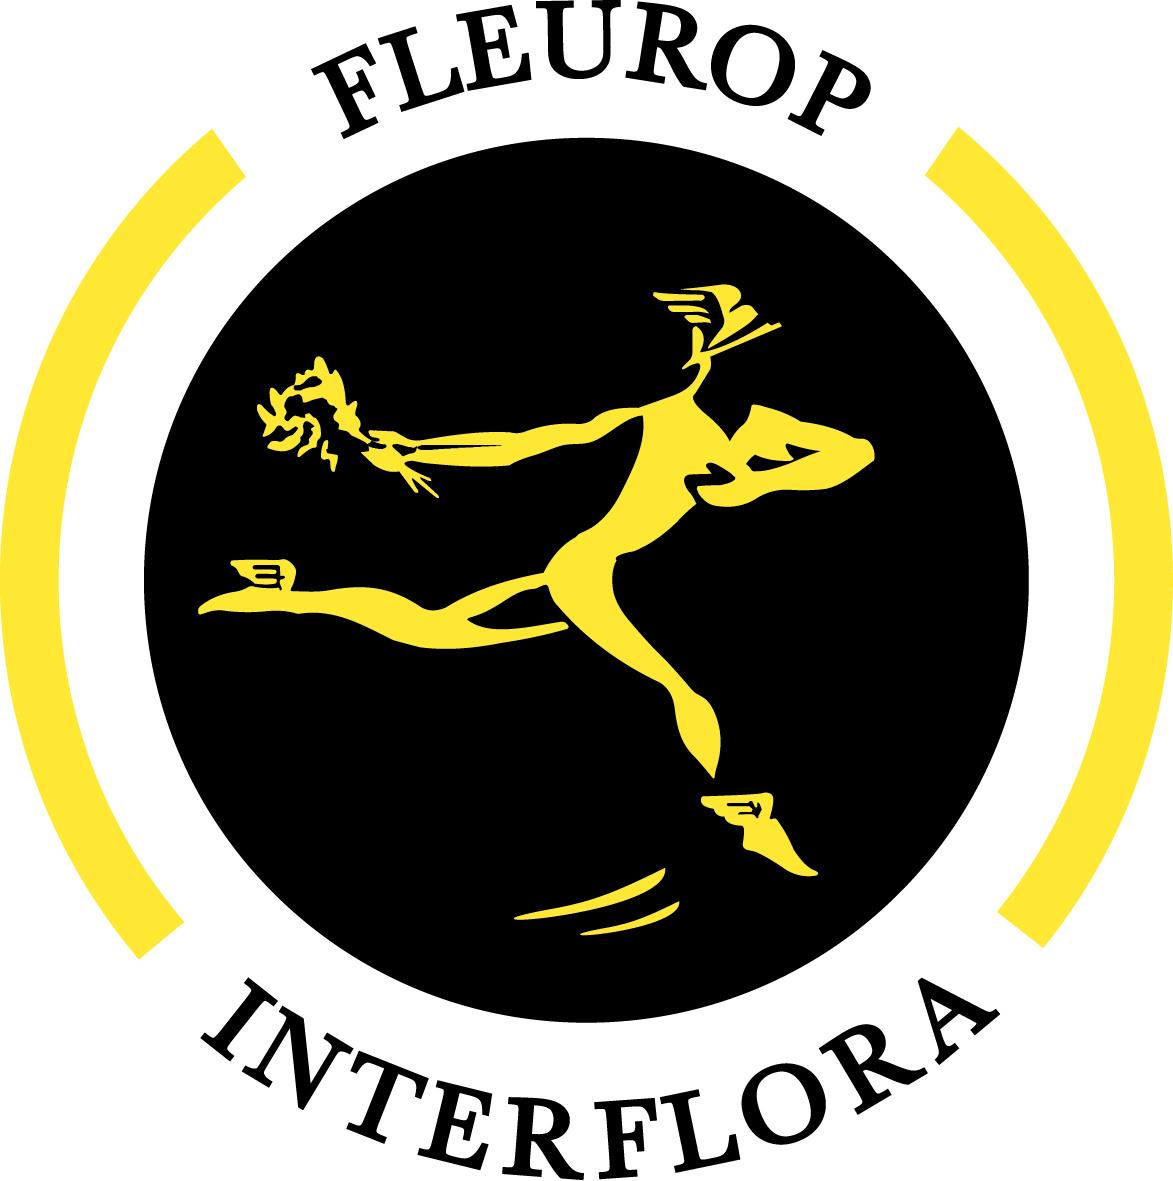 Interflora logo clipart jpg freeuse Our References Verify Quality Translations jpg freeuse